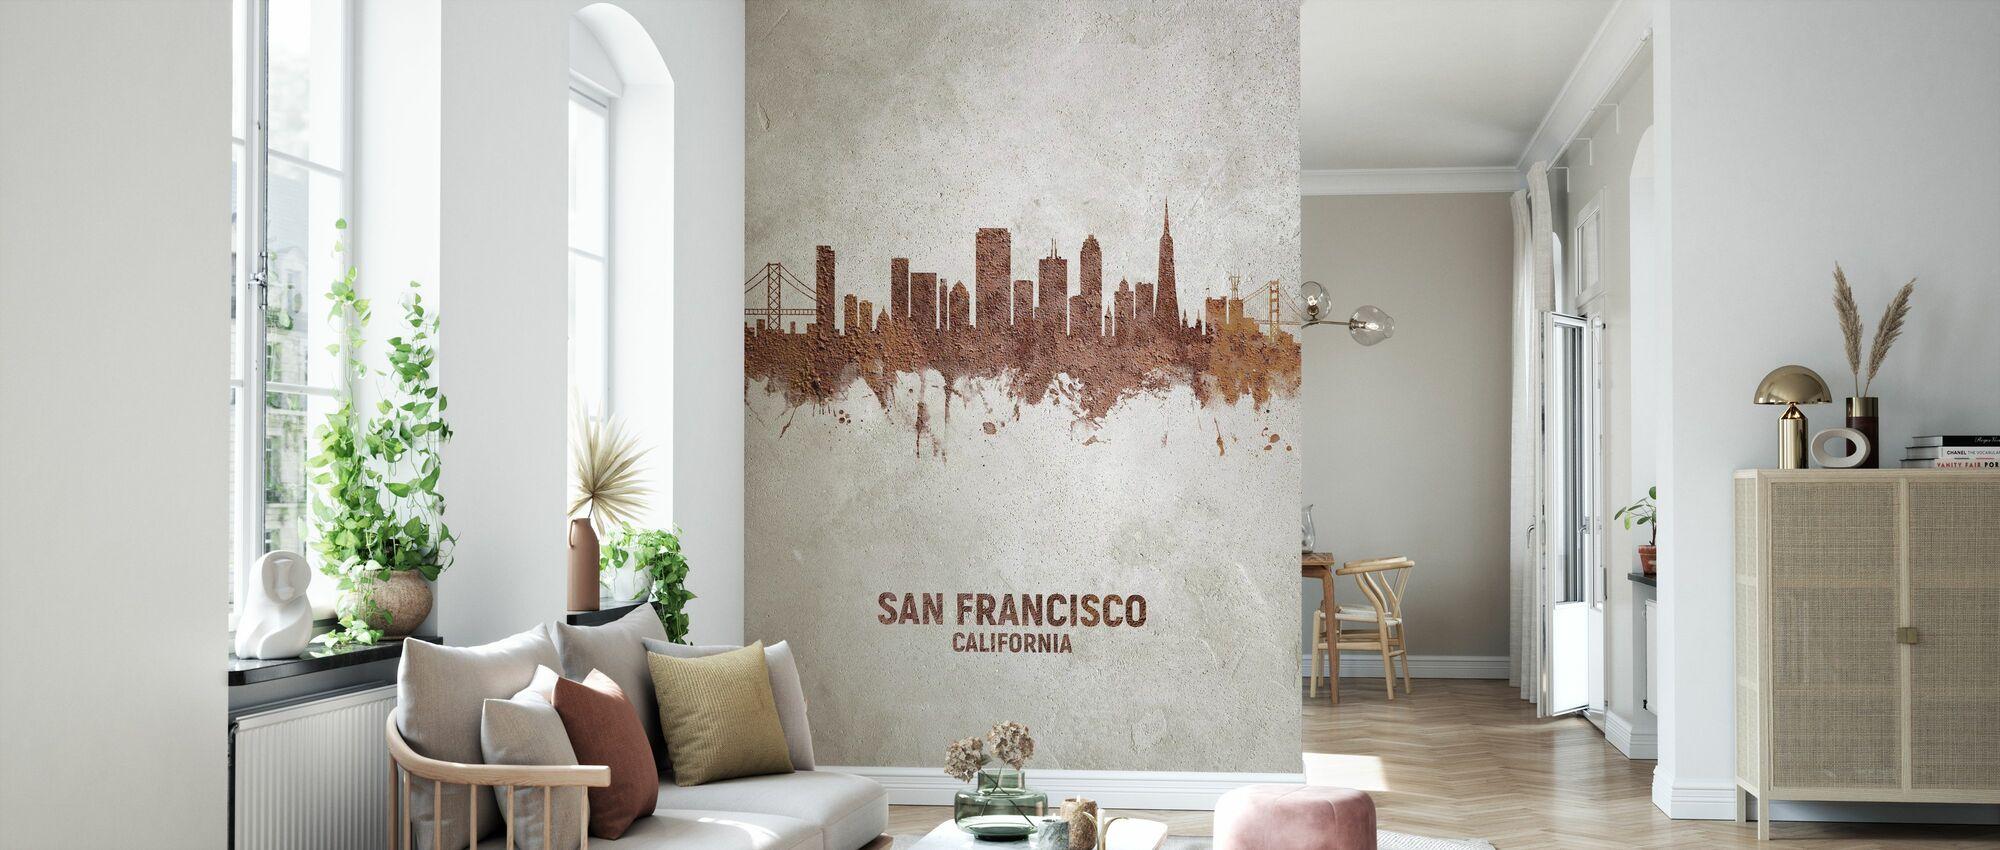 San Francisco California Rust Skyline - Wallpaper - Living Room